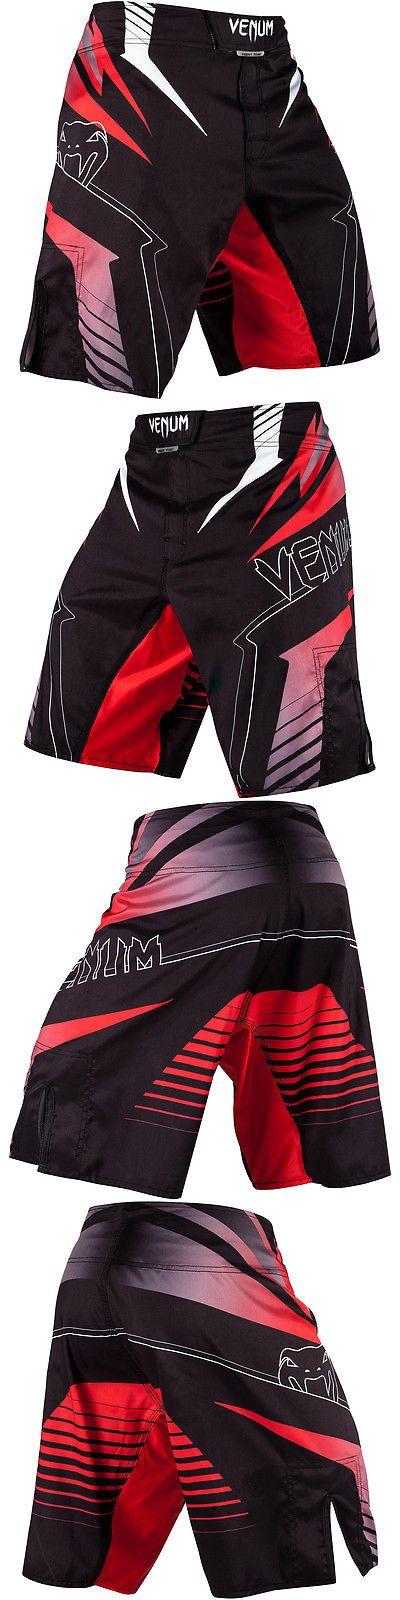 Shorts 73982: Venum Sharp 3.0 Flex System Closure Mma Fight Shorts - Black Red -> BUY IT NOW ONLY: $69.99 on eBay!